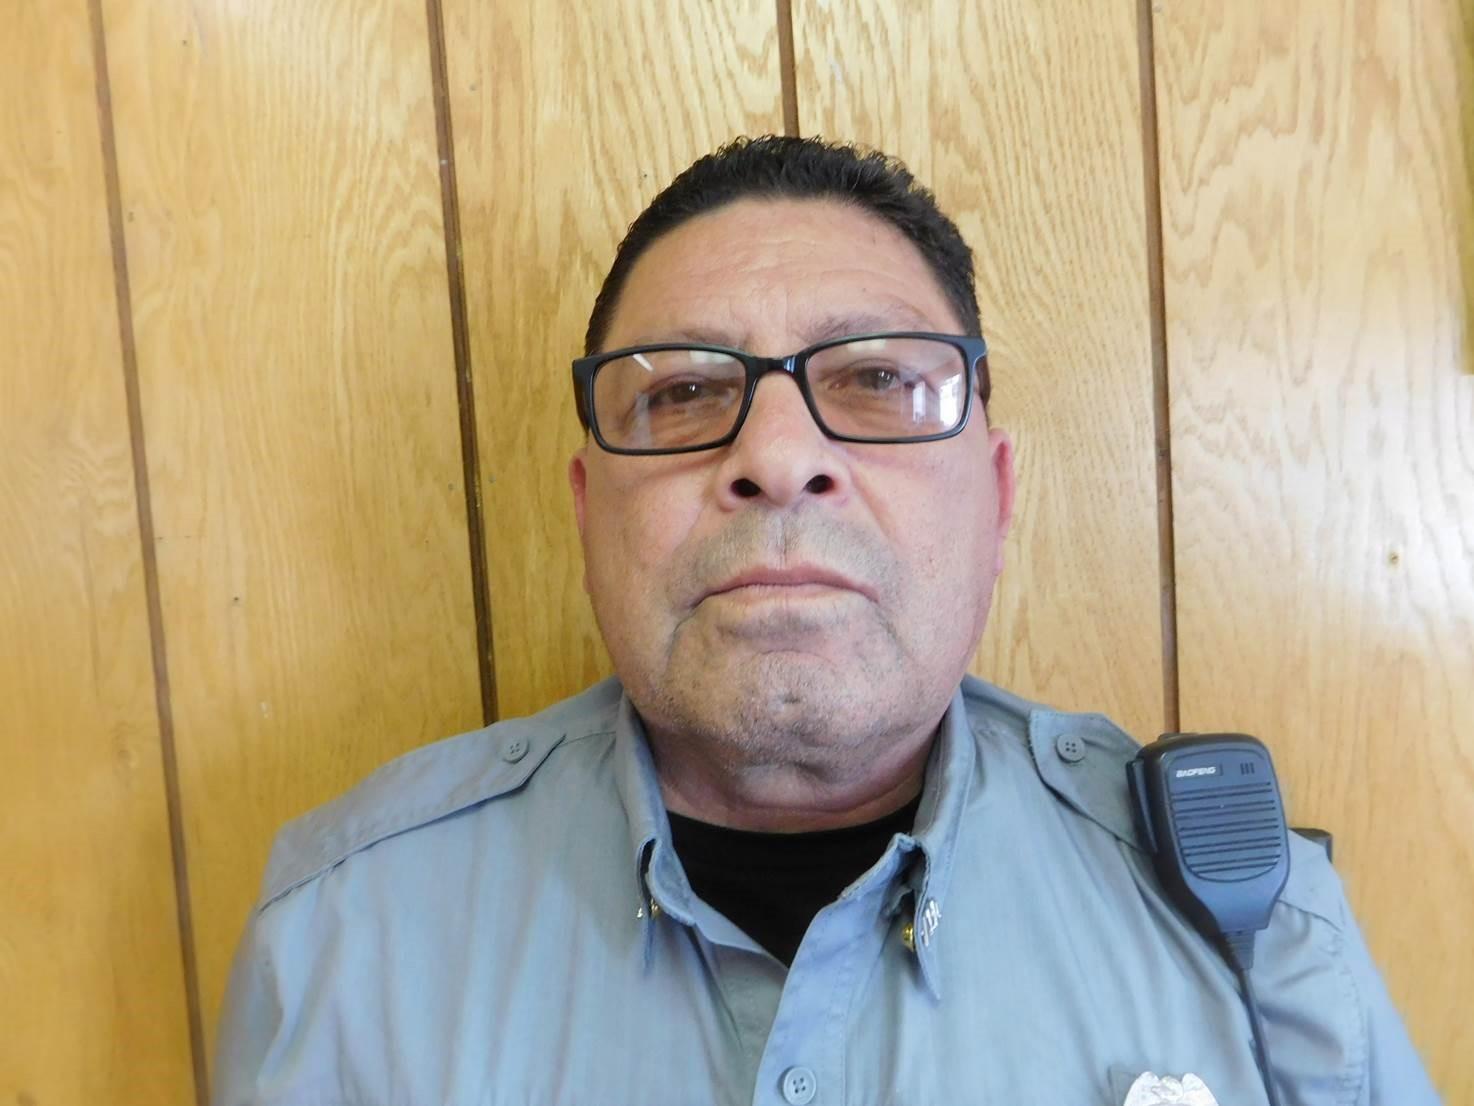 Police Officer Arturo Villegas | Alamo Police Department, Georgia